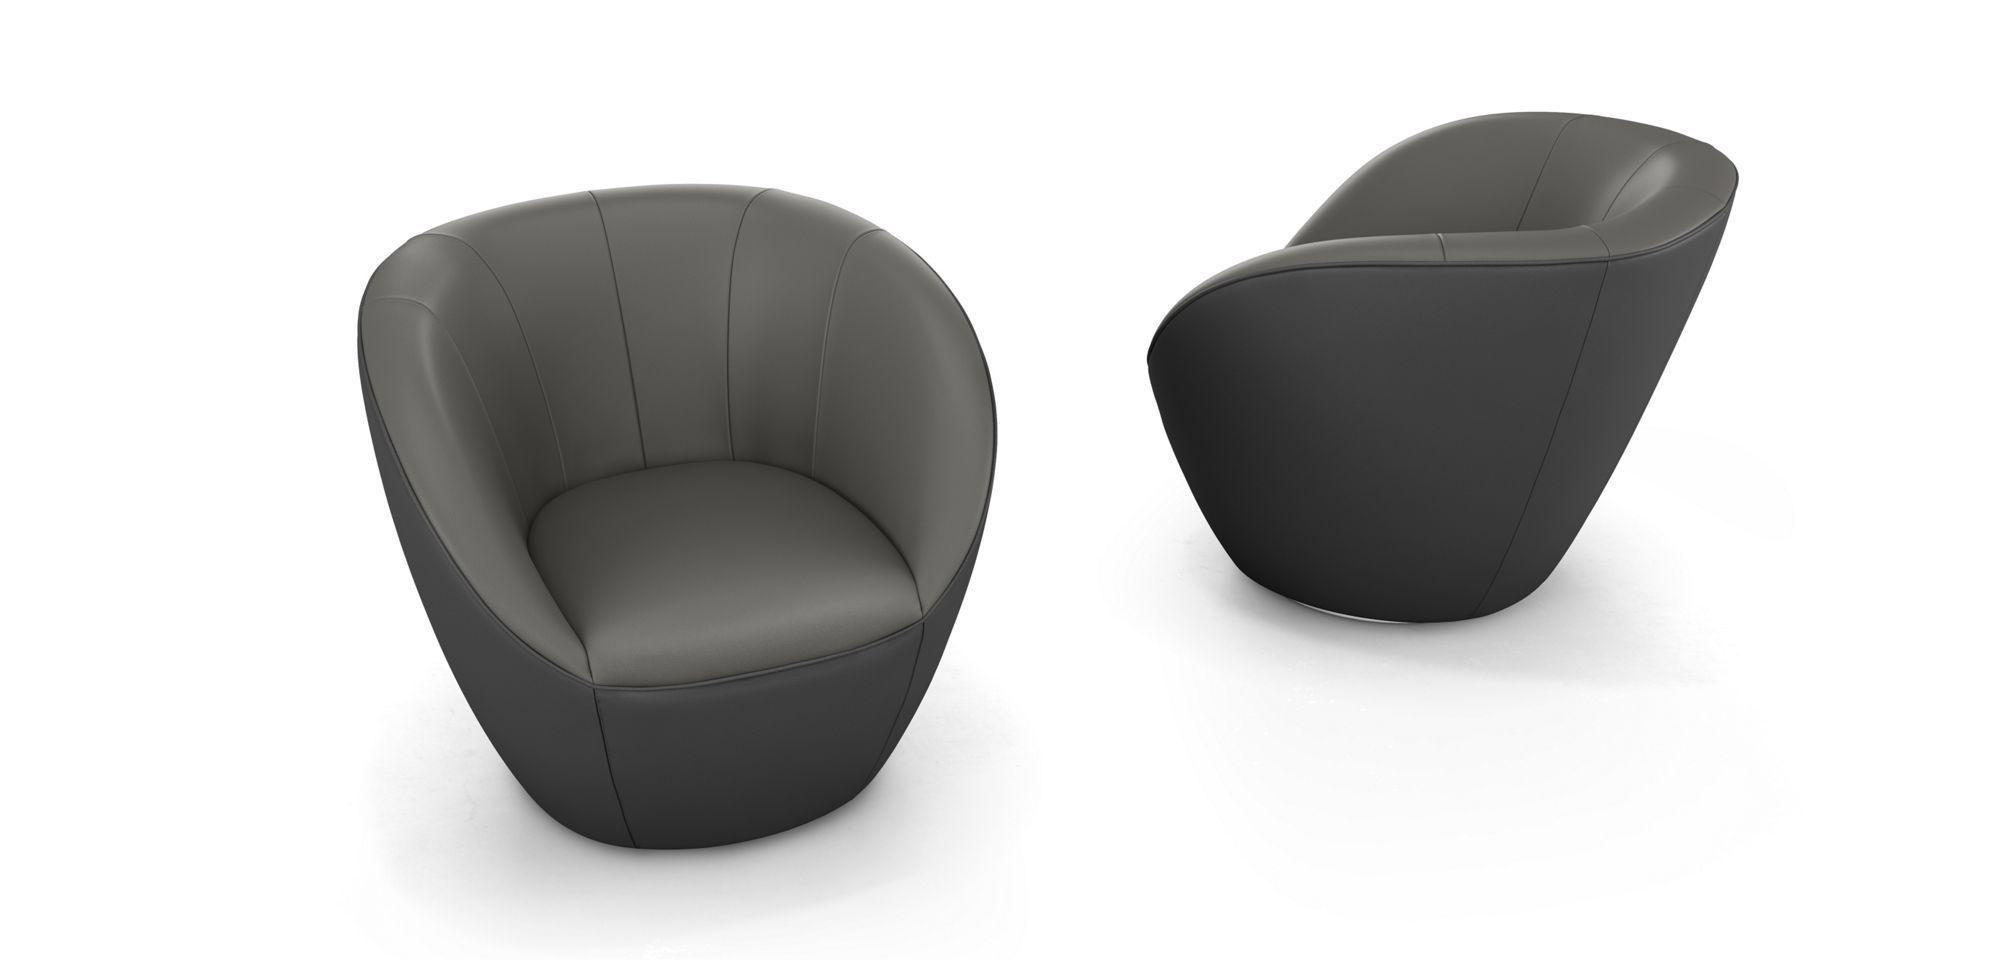 Superb Edito Armchair Armchairs Roche Bobois Design Beatyapartments Chair Design Images Beatyapartmentscom